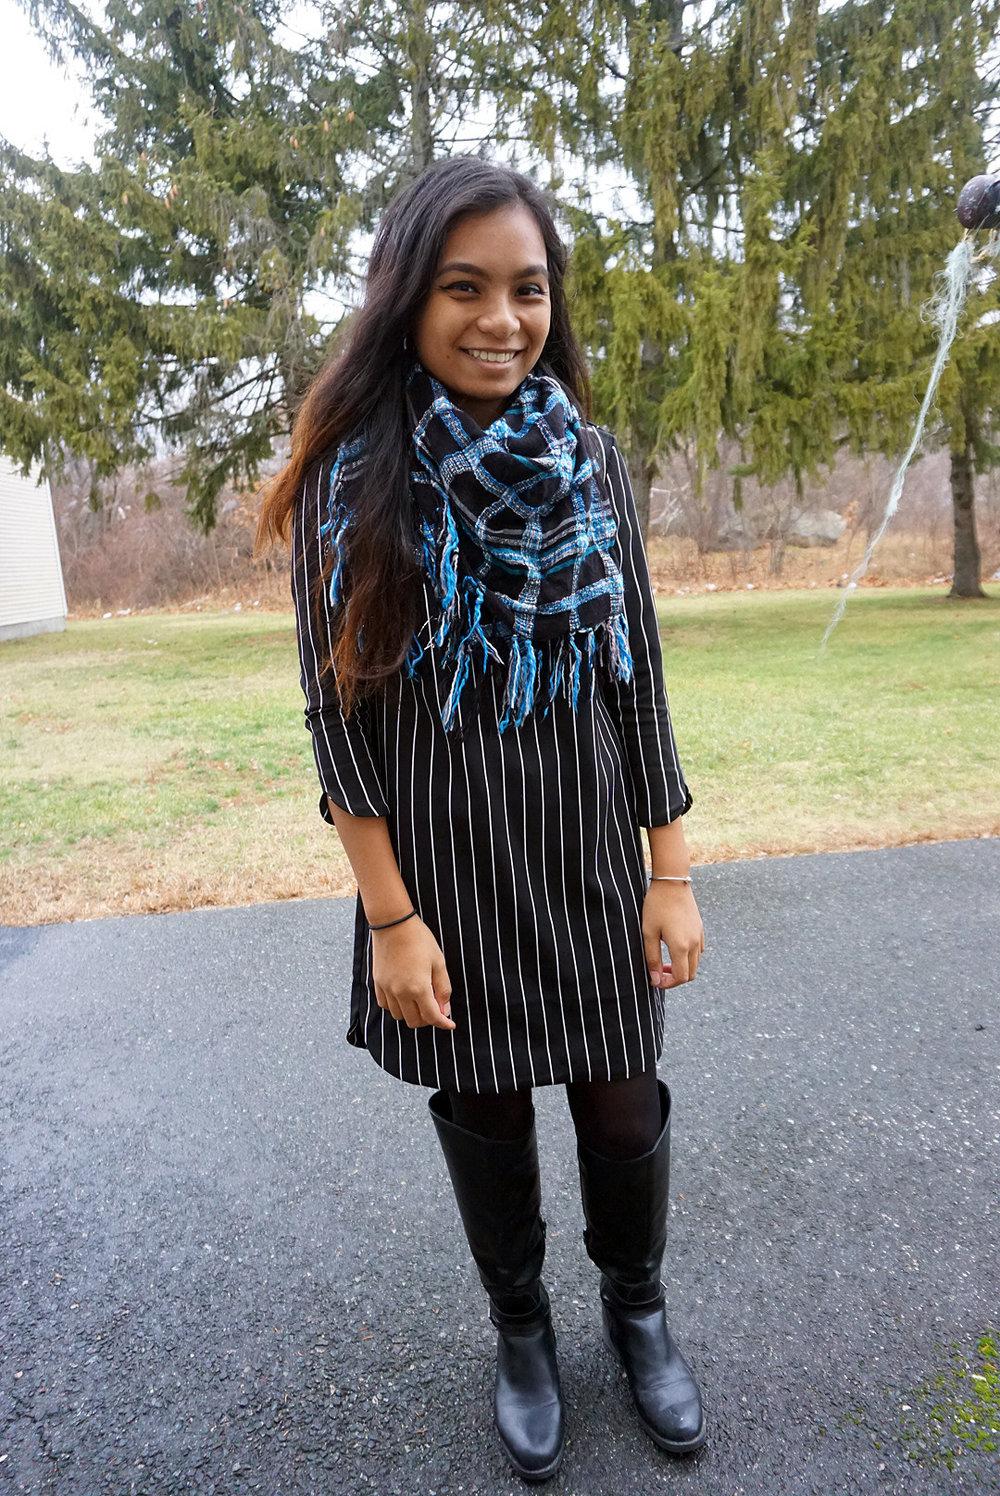 Black-White-Striped-Dress-Blogger-Style-LINDATENCHITRAN-16-1080x1616.jpg